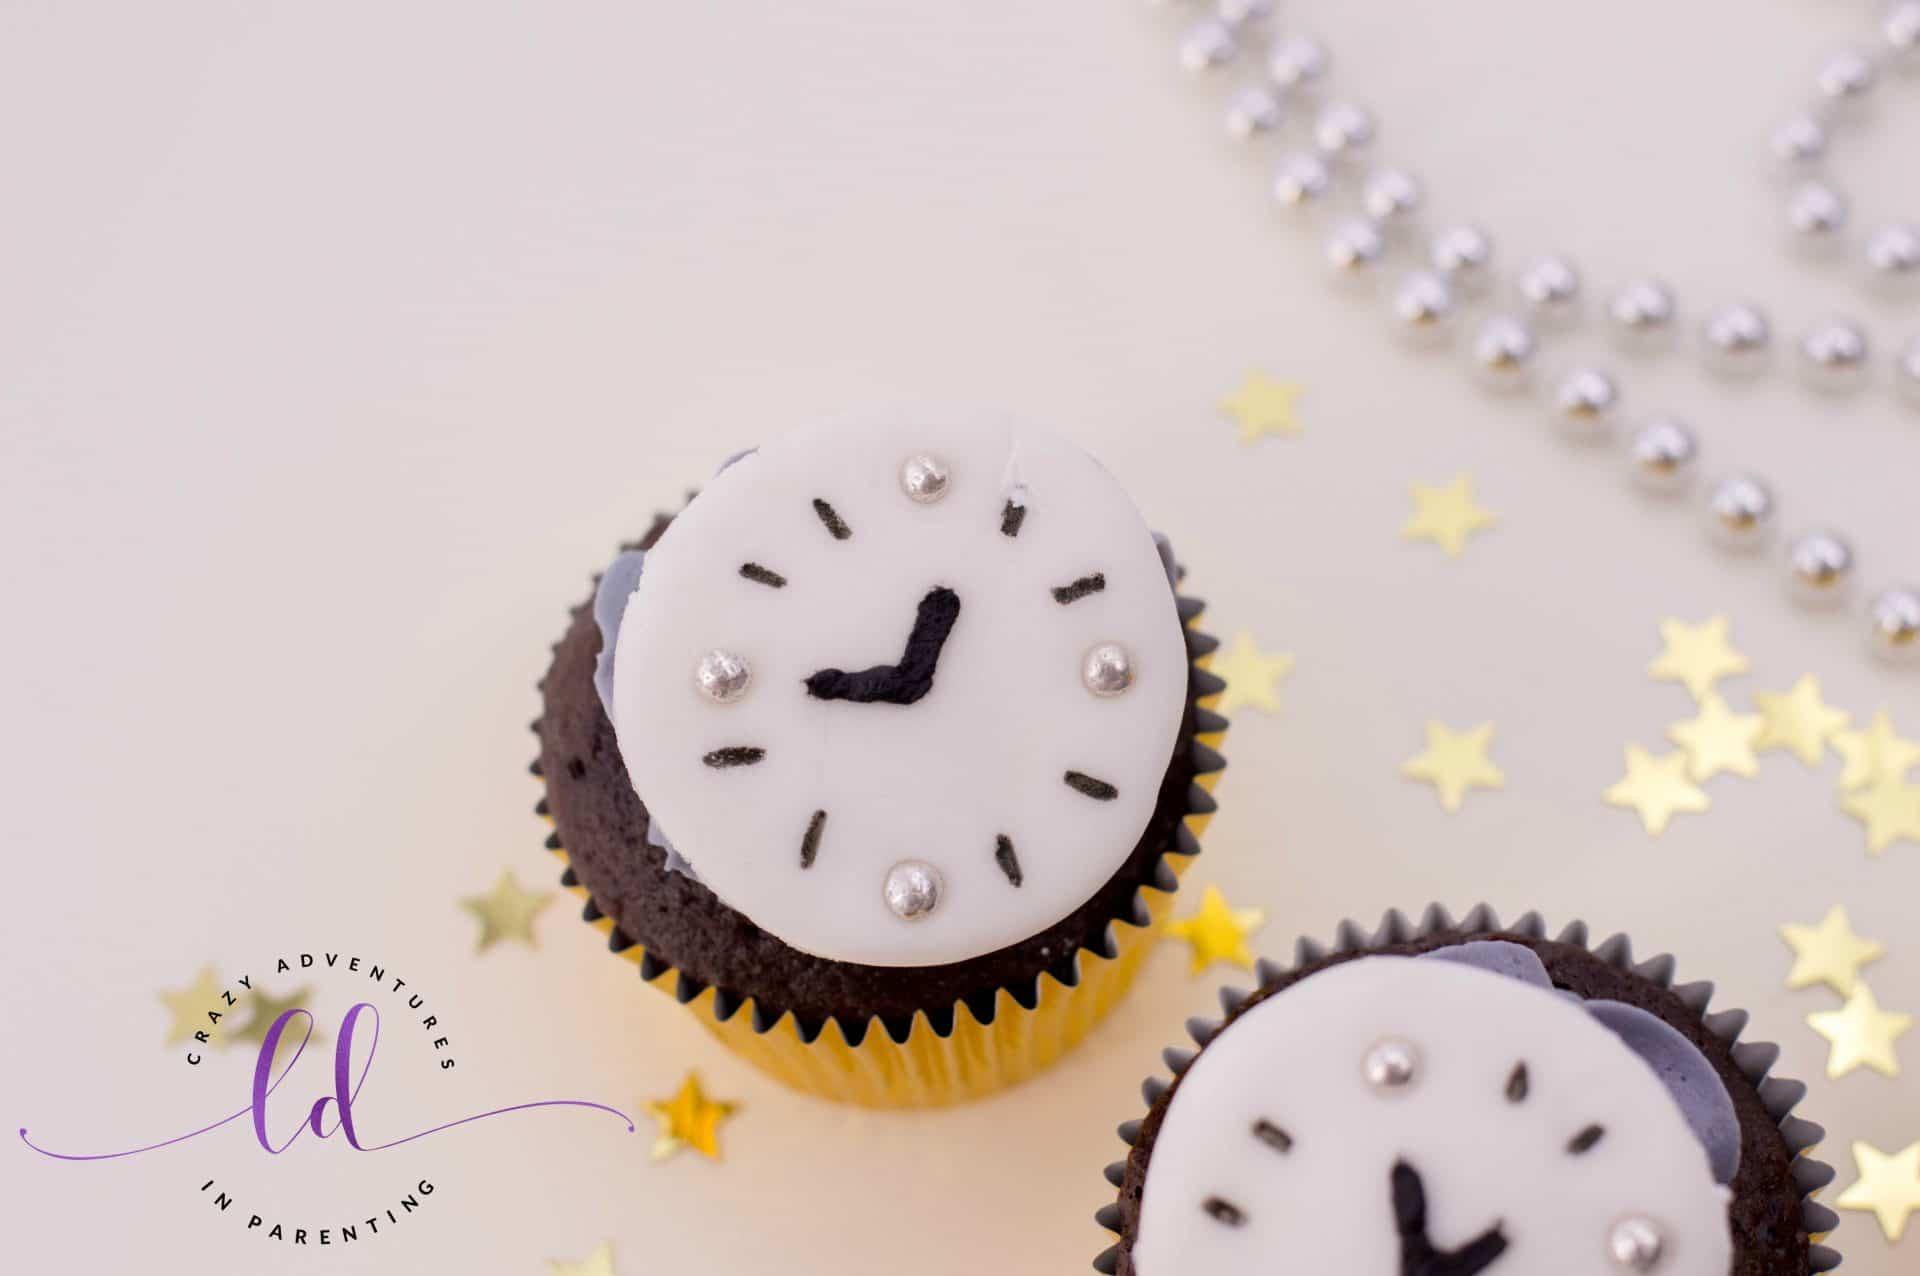 Place Fondant Clock on Countdown Cupcakes